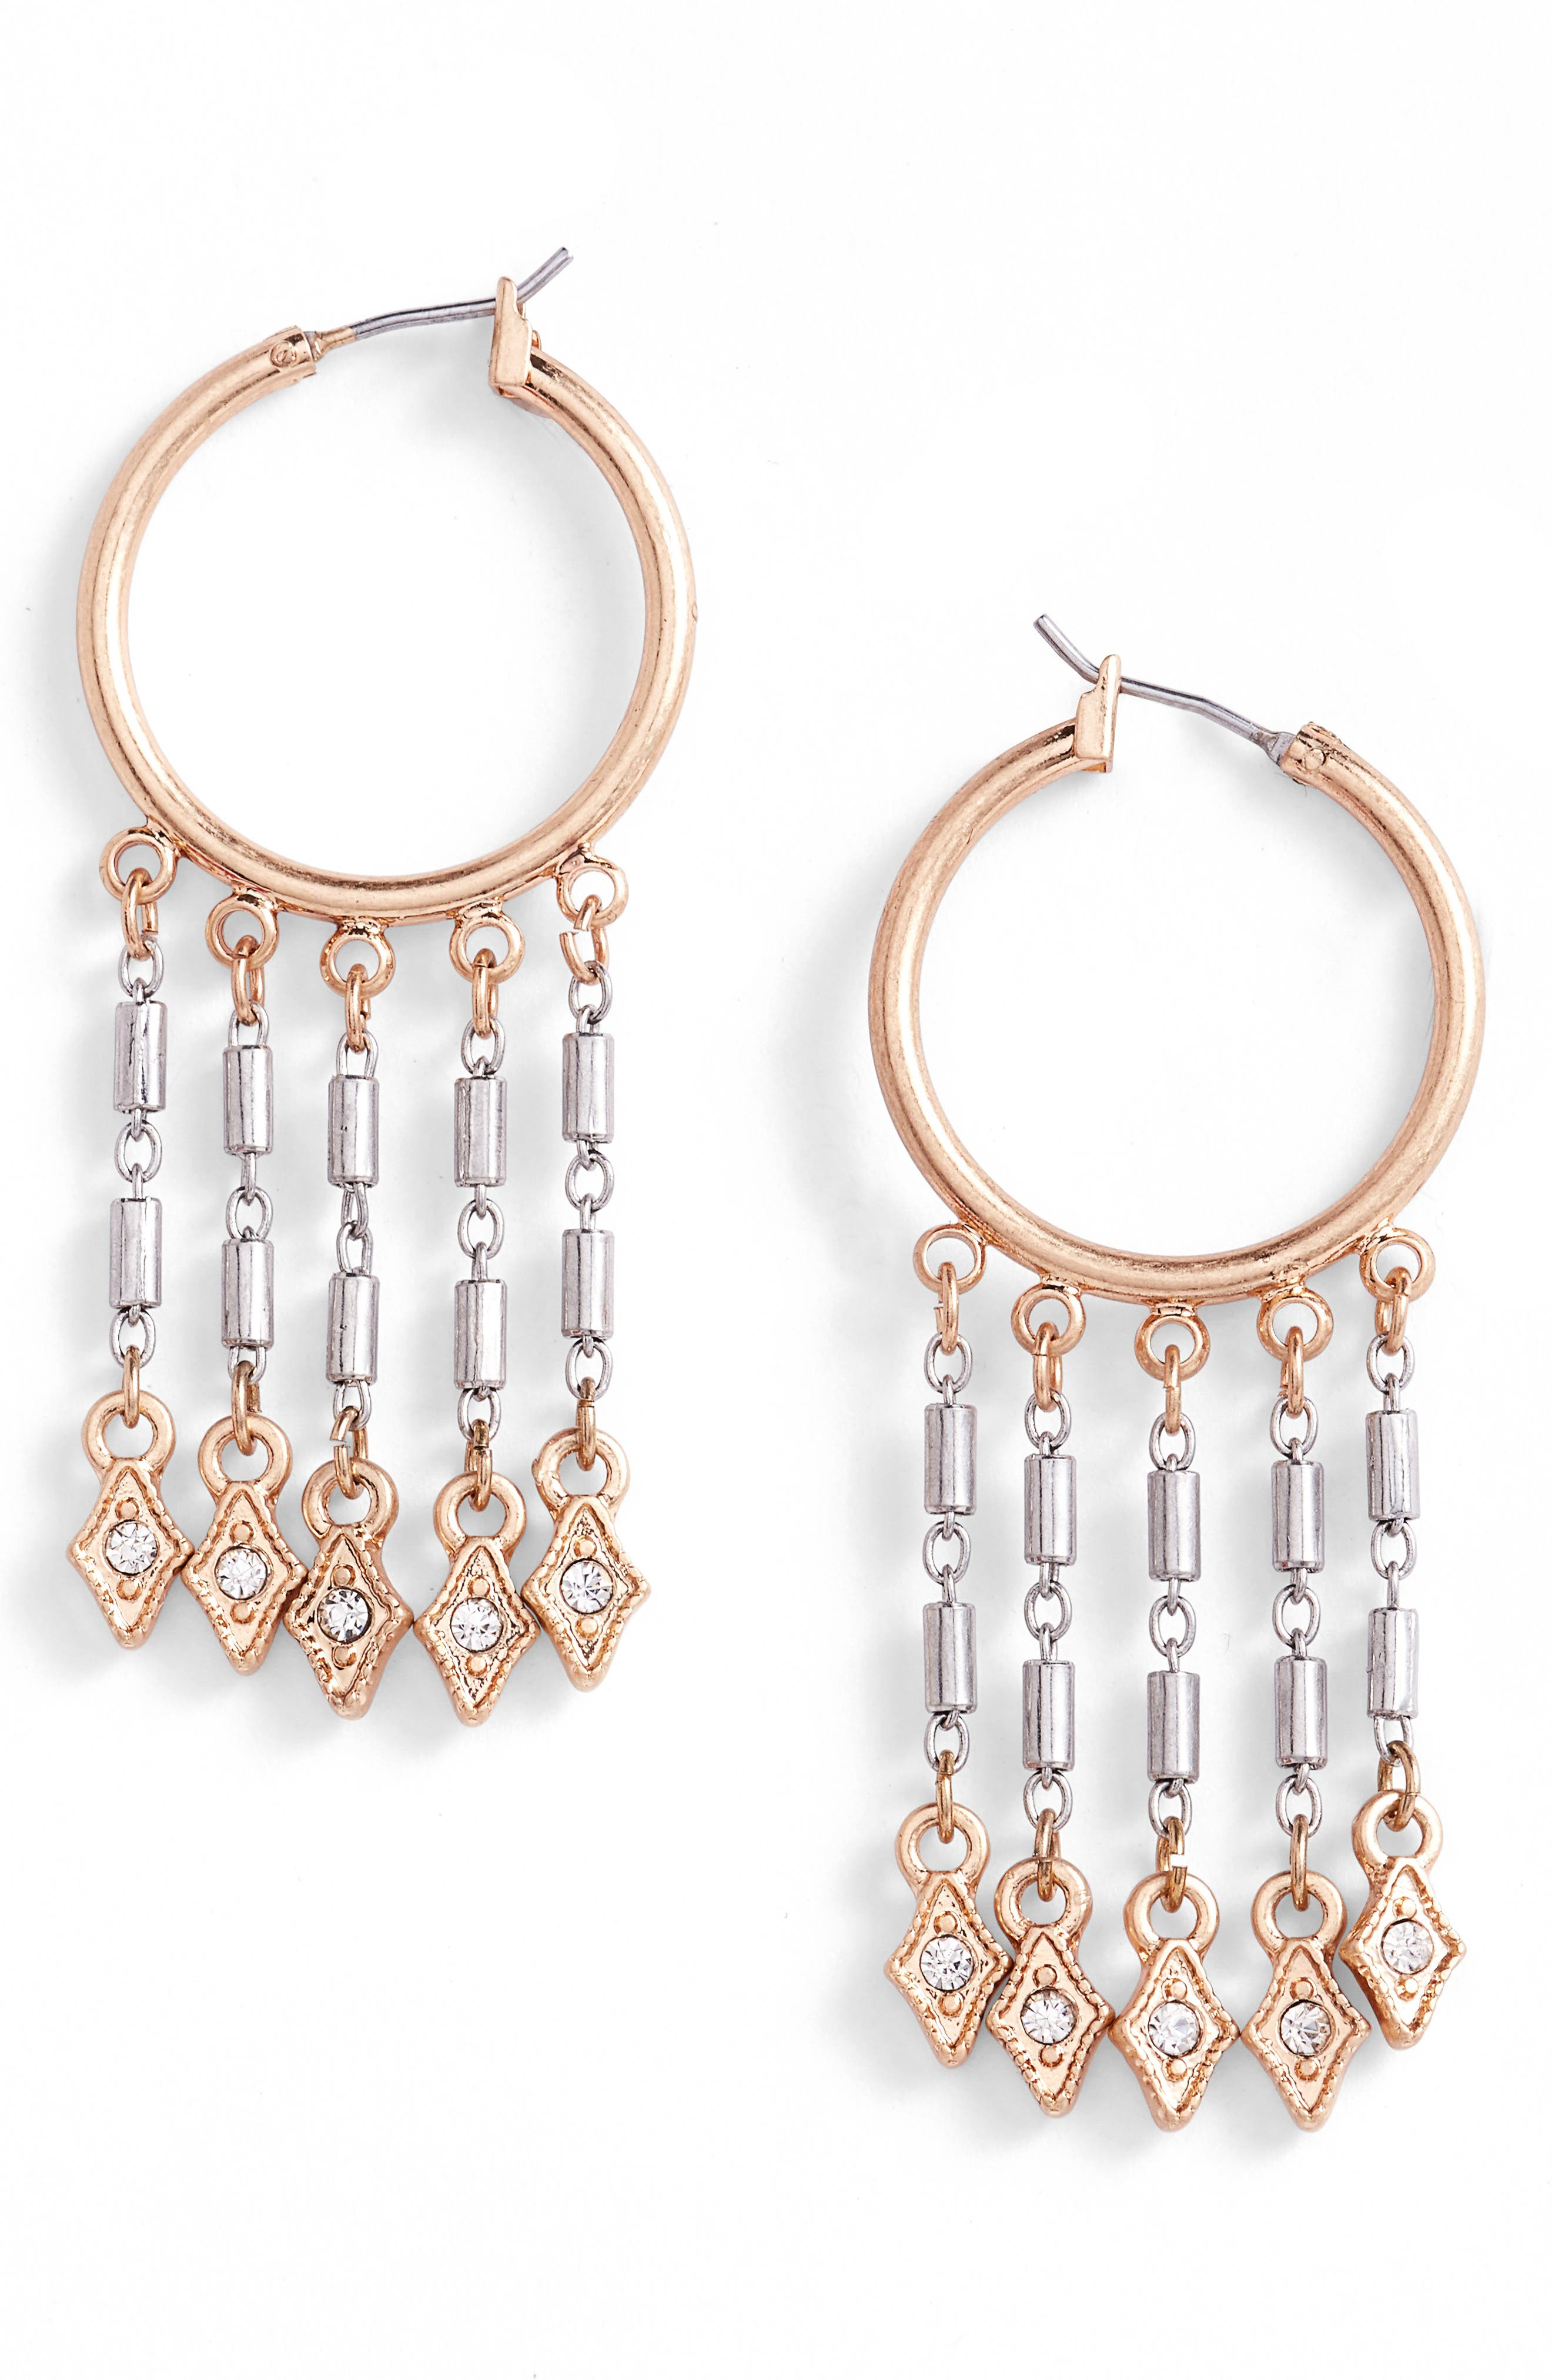 Main Image - Treasure & Bond Medium Fringe Hoop Earrings